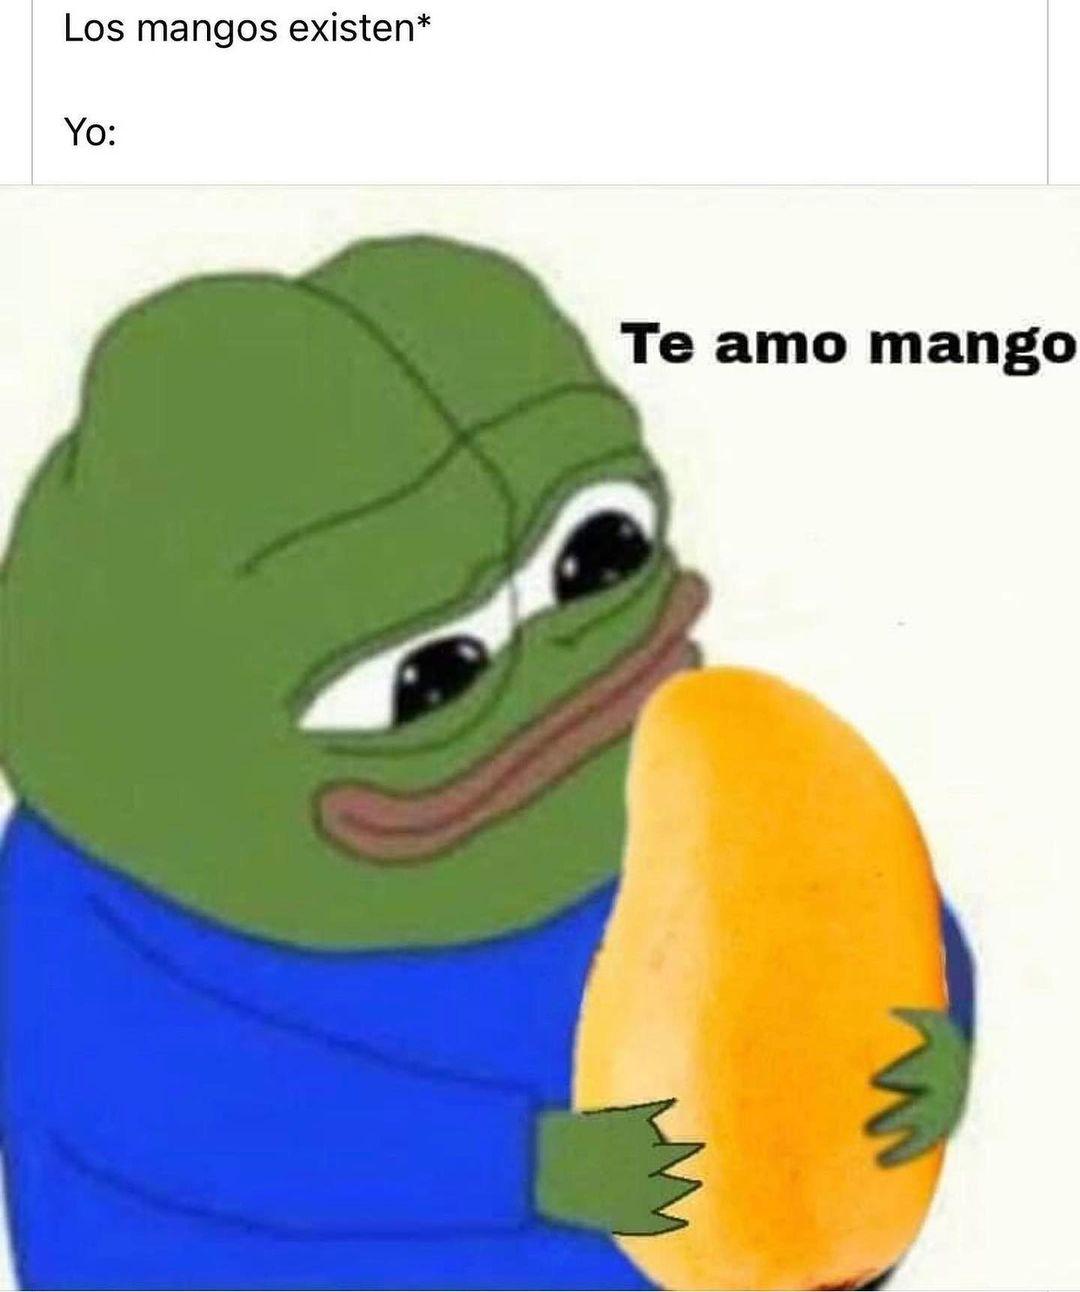 Los mangos existen*  Yo: Te amo mango.